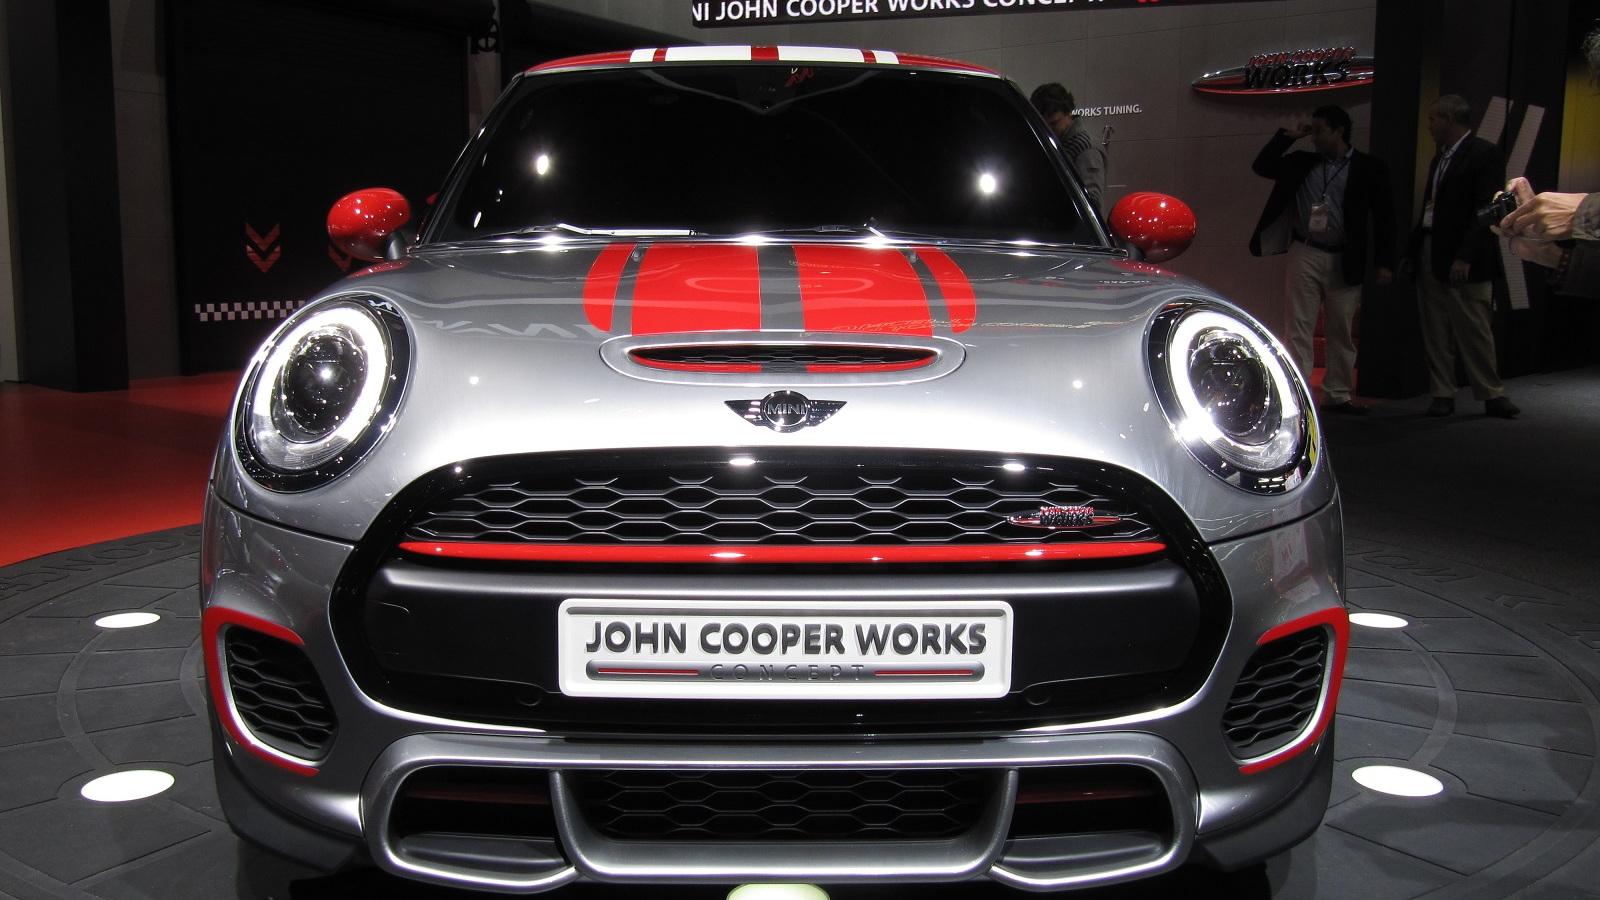 MINI John Cooper Works concept, unveiled at 2014 Detroit Auto Show